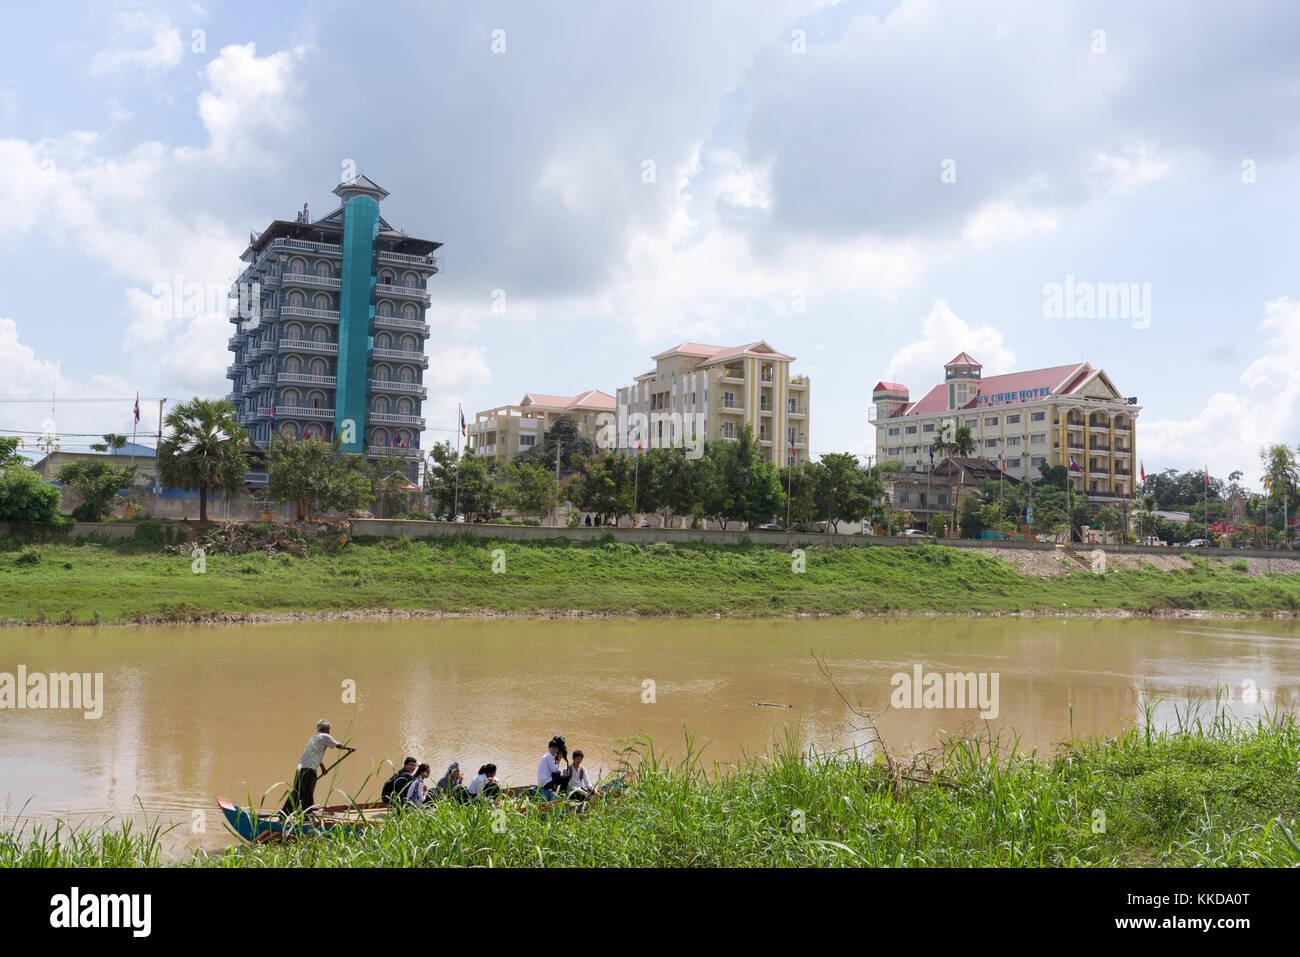 Stung sangke River en la ciudad de Battambang Imagen De Stock